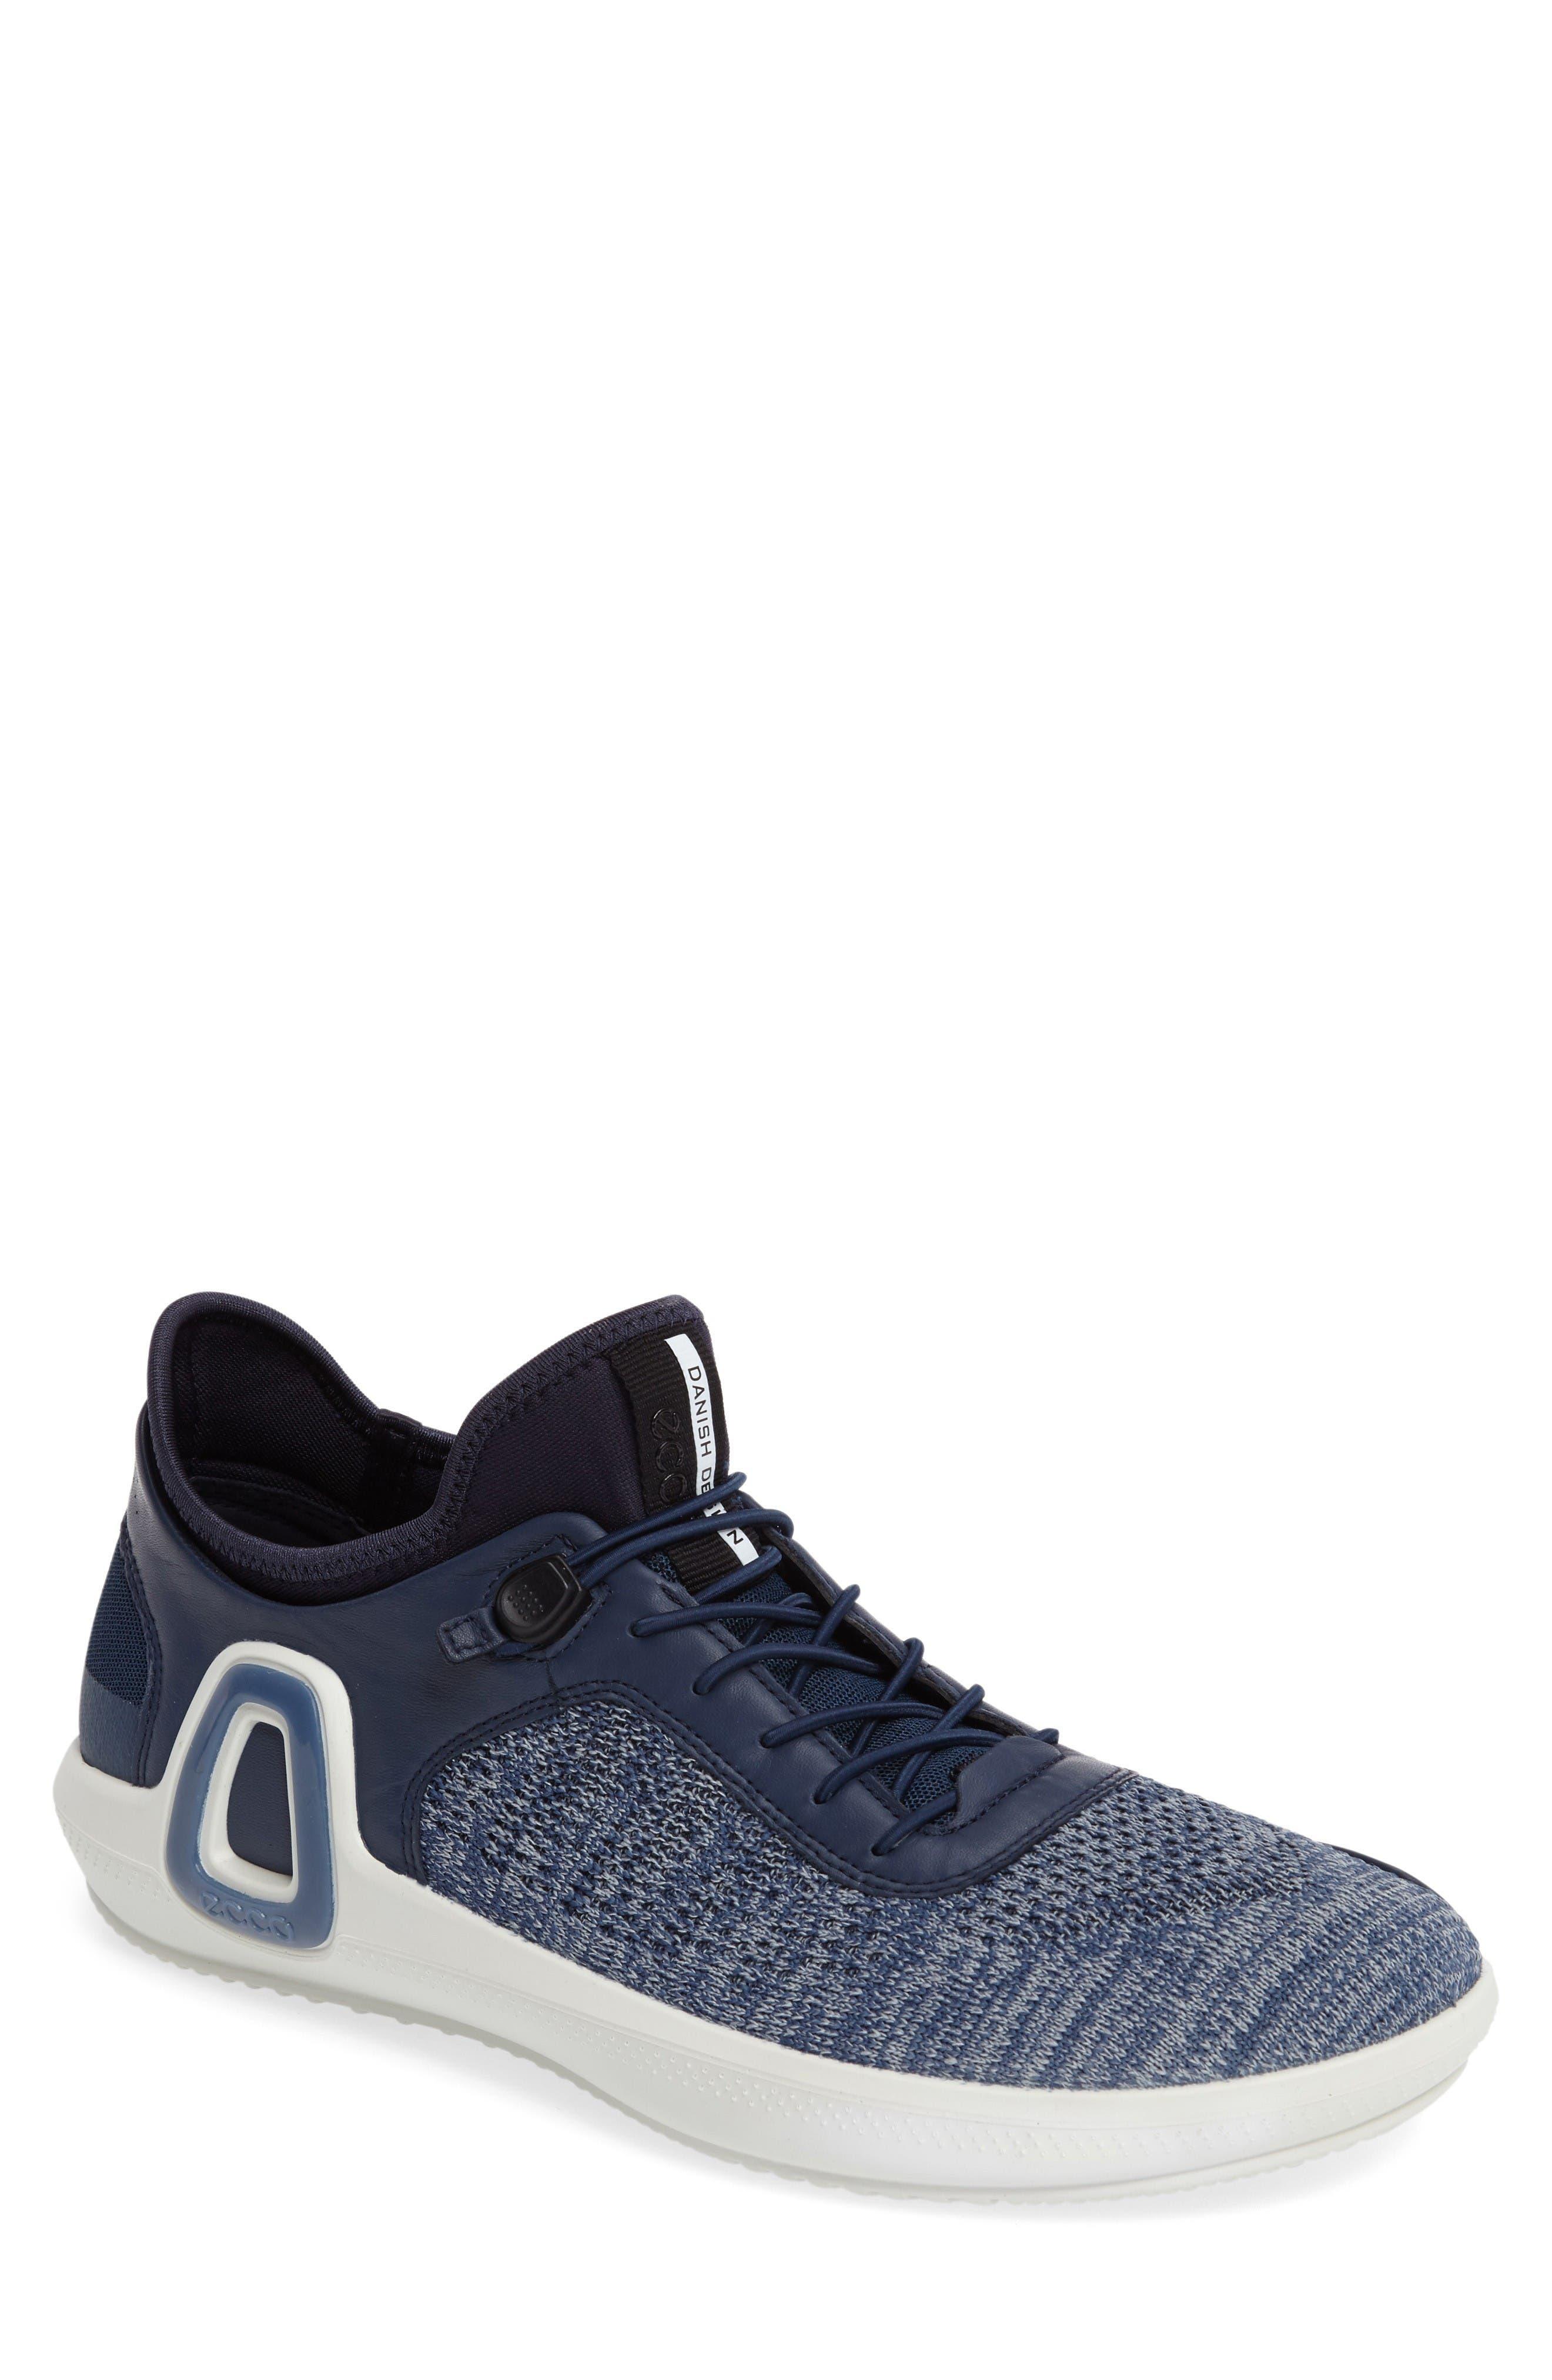 ECCO Intrinsic 3 Sneaker (Men)